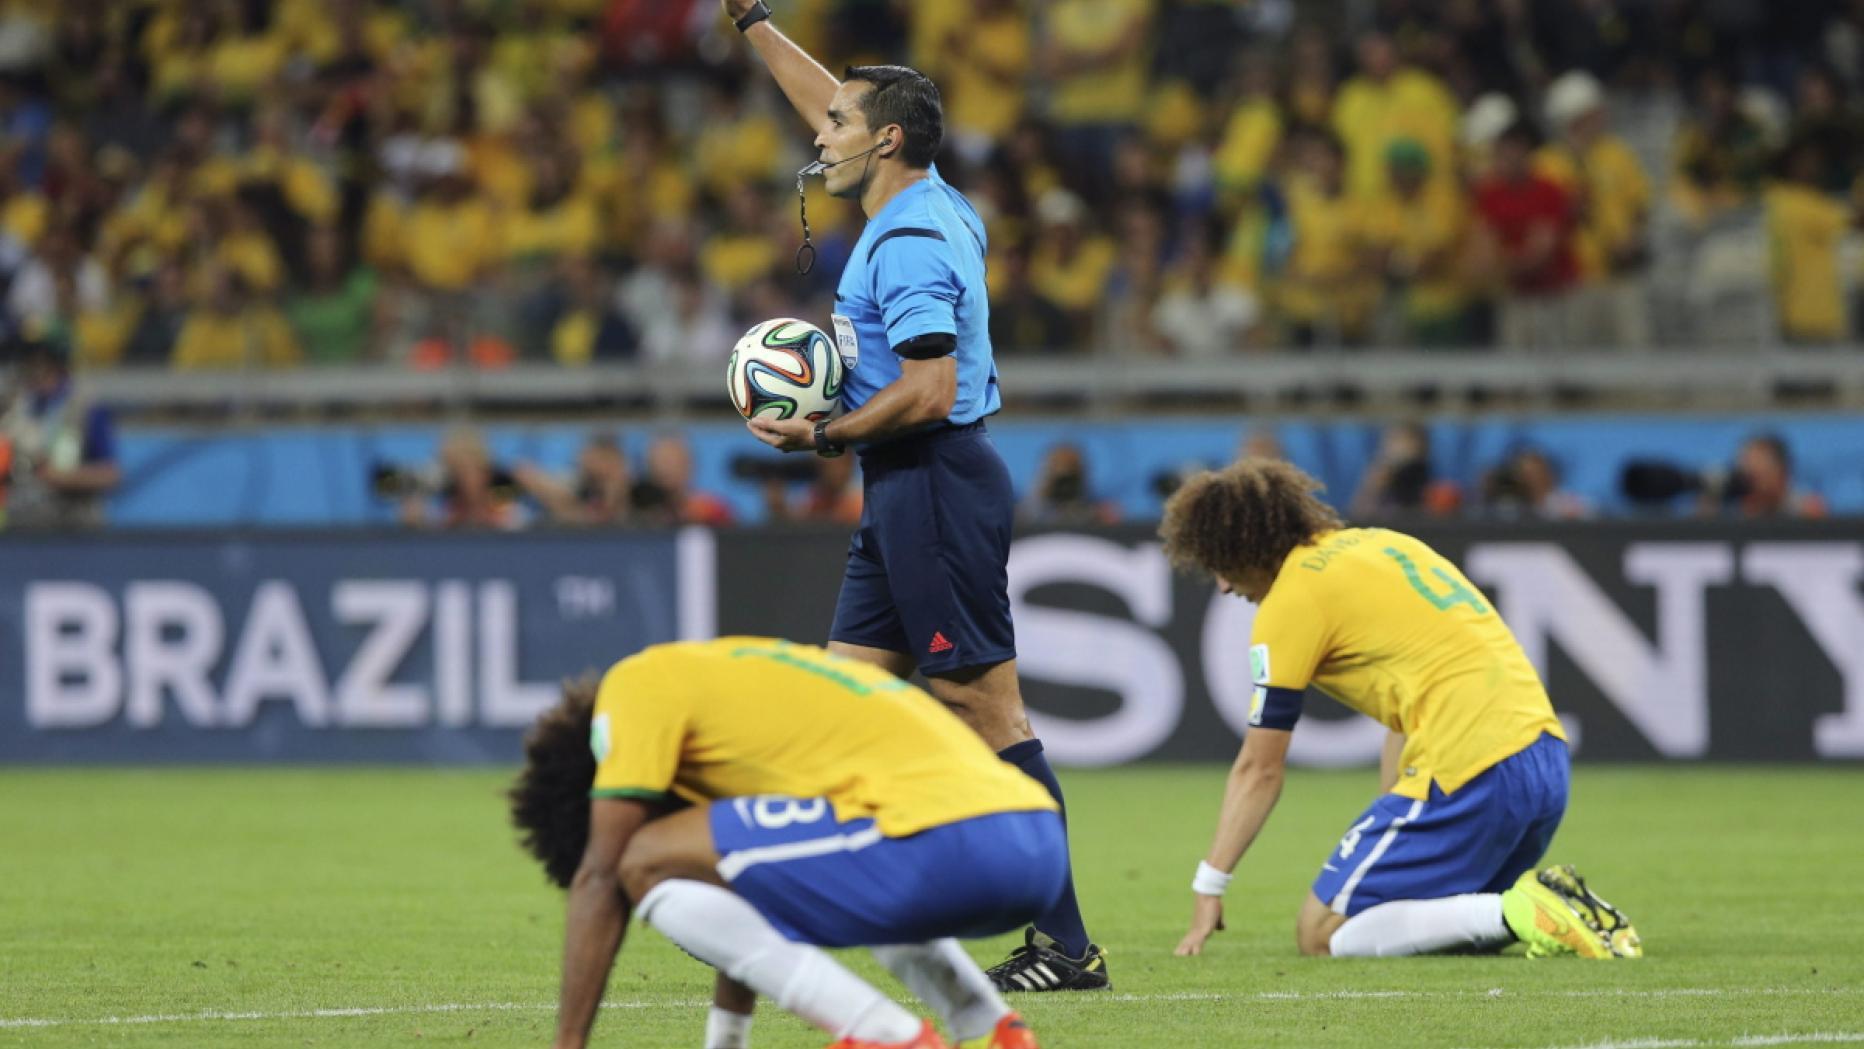 Pressestimmen Zum Brasilien Aus Kurier At